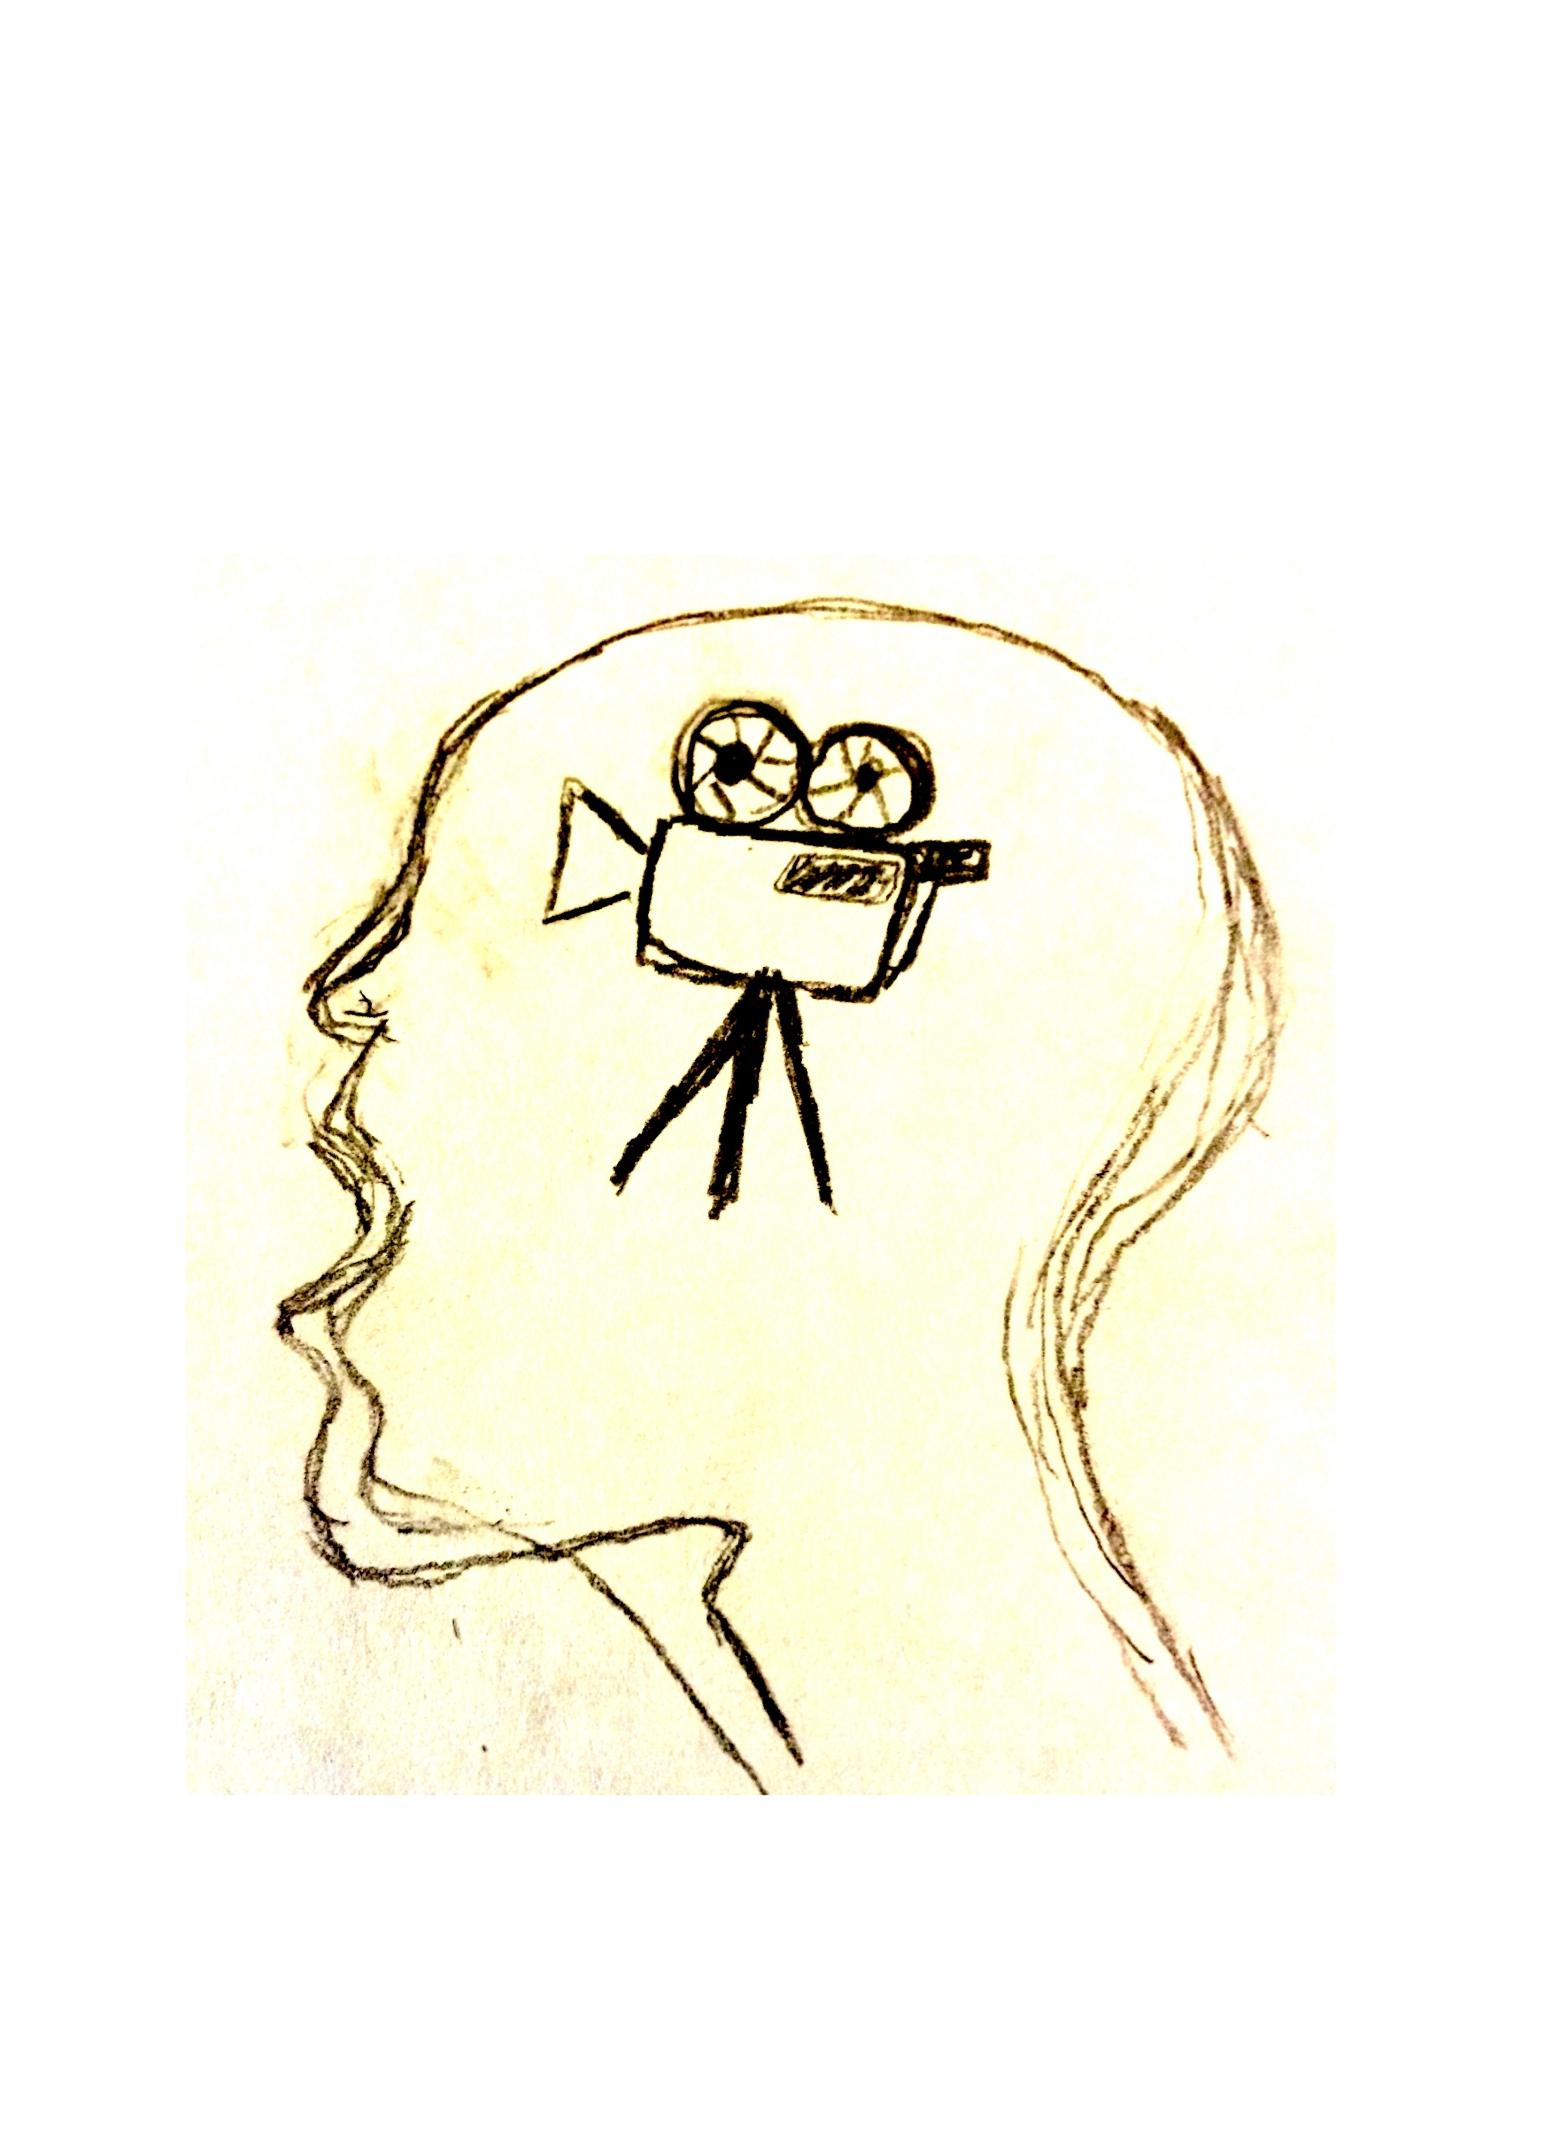 Sketch of a human head